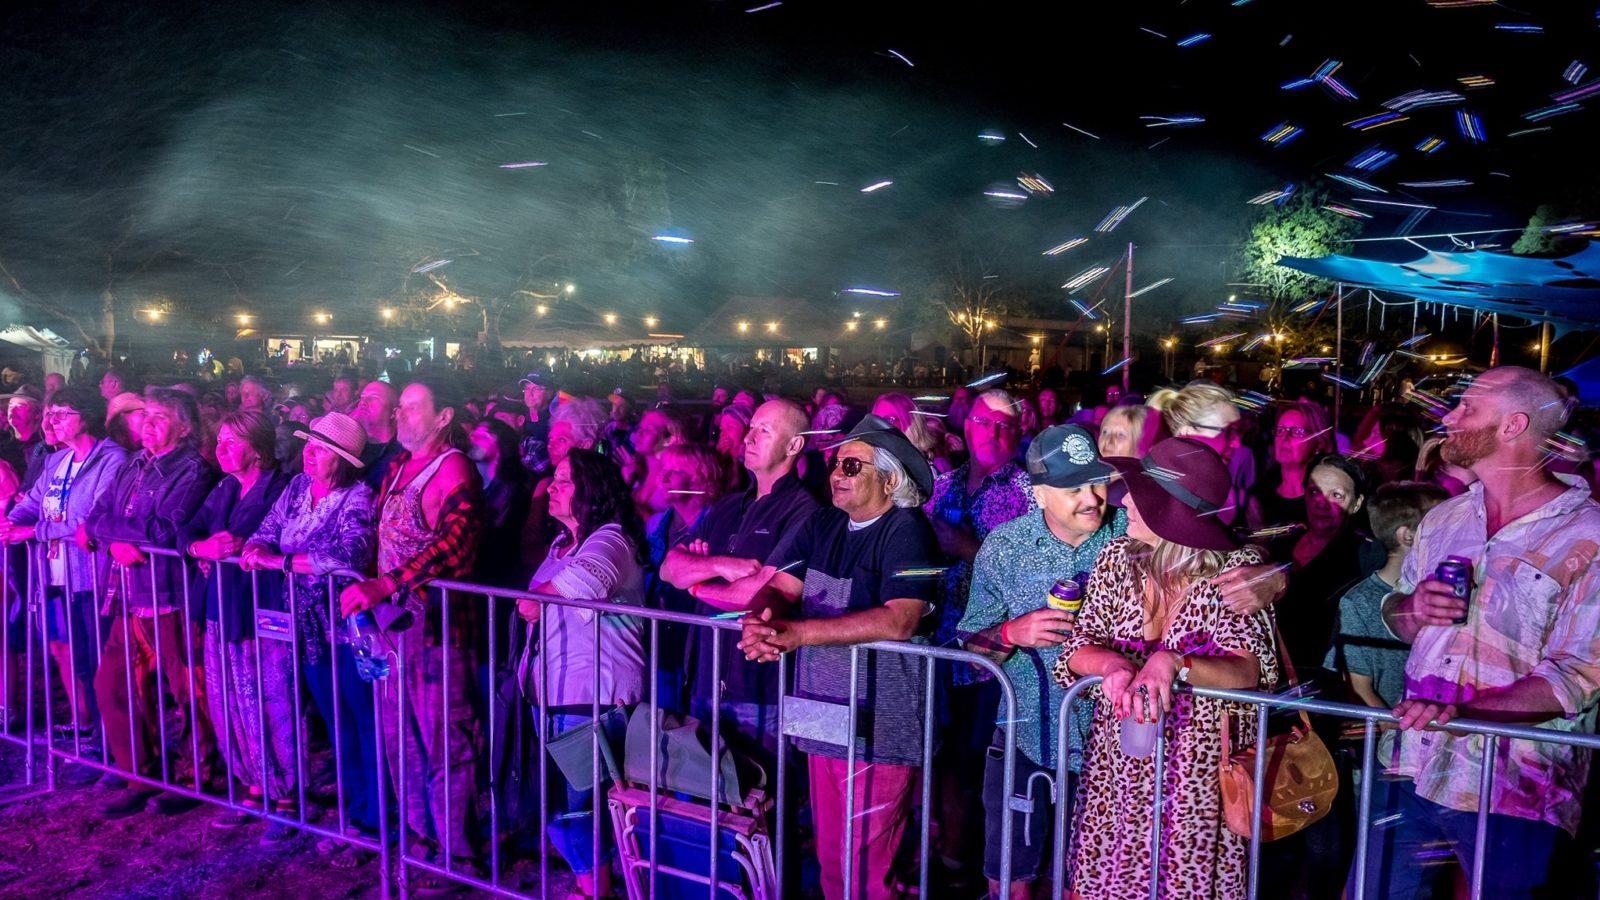 Wingham Akoostik Music Festival at night